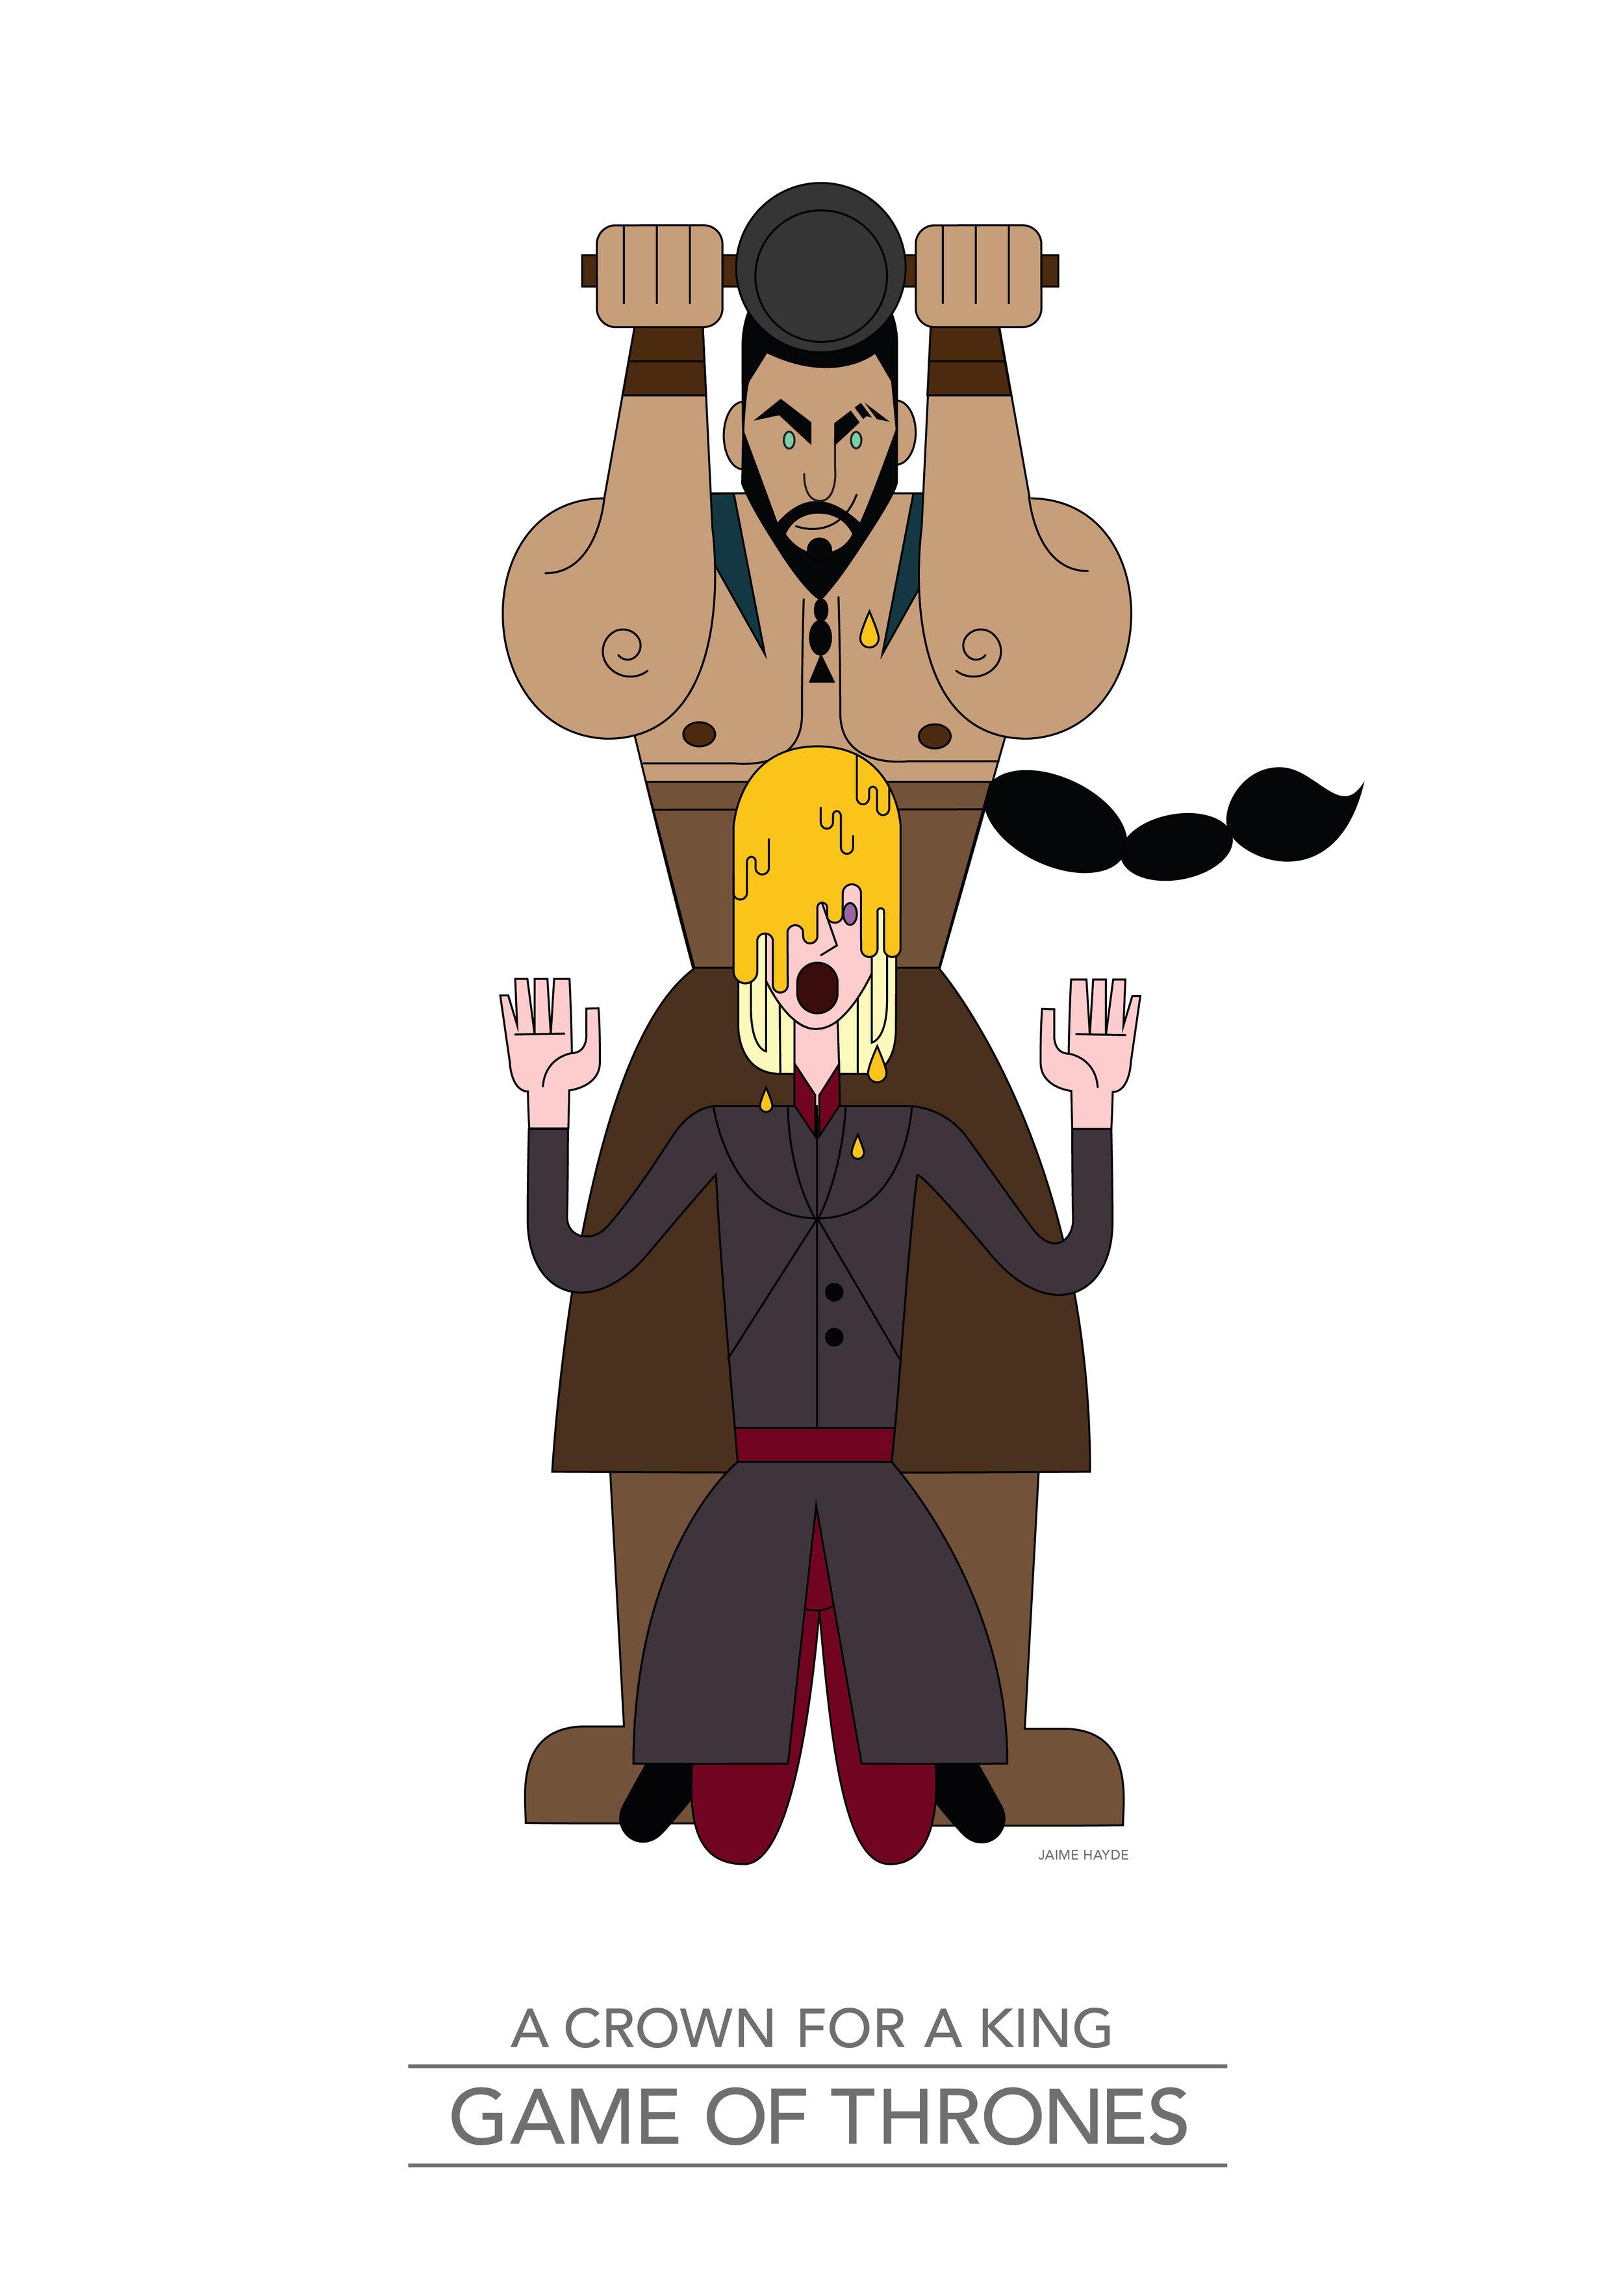 Game-of-thrones-Juego-de-tronos-illustration-khal drogo.jpg